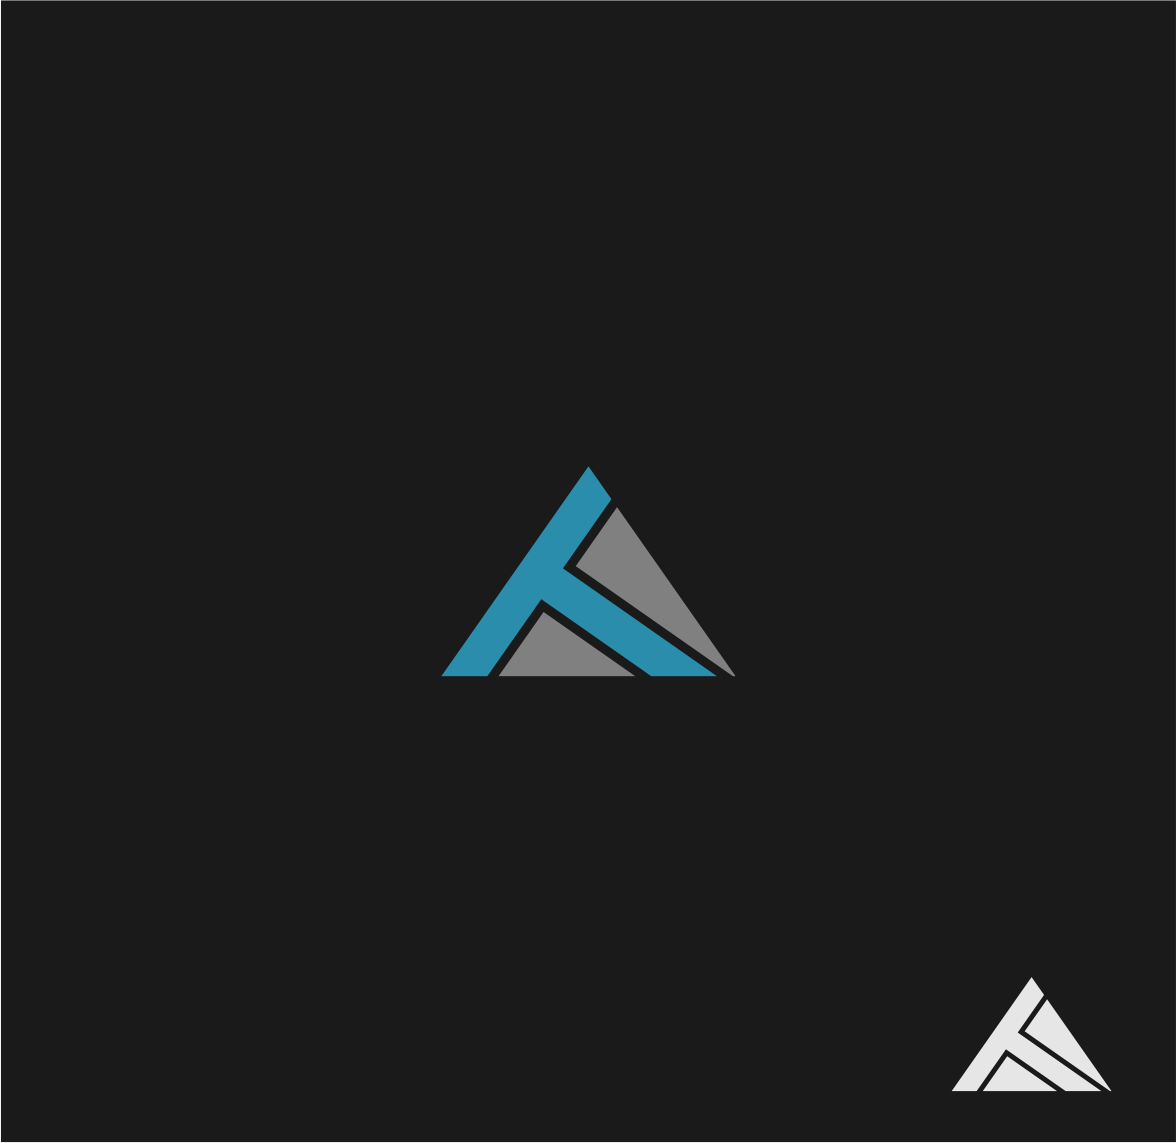 Logo Design by haidu - Entry No. 97 in the Logo Design Contest Imaginative Logo Design for TAYA.